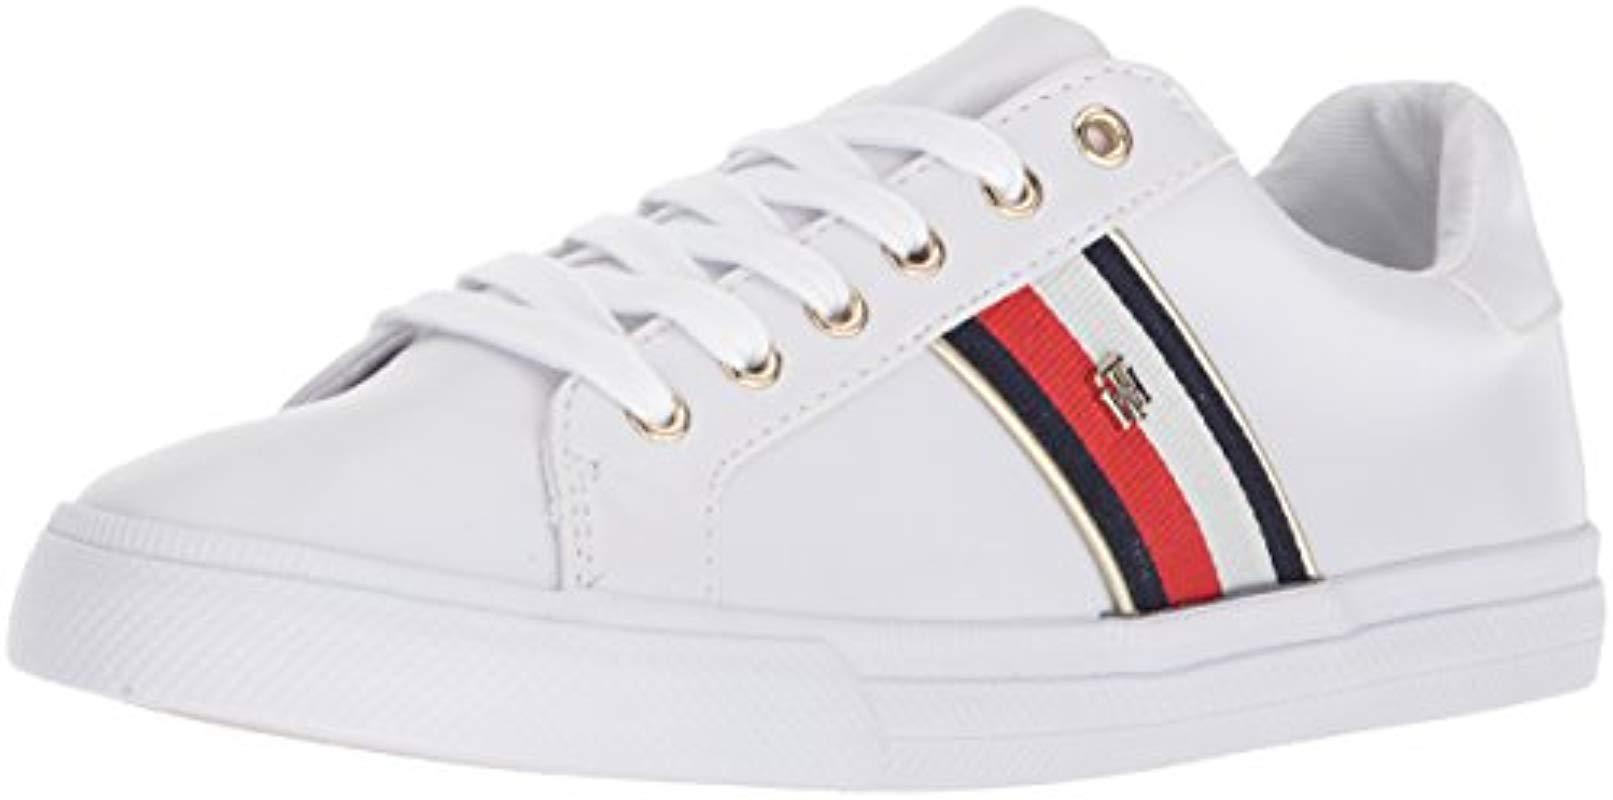 316cb0fc6983f Lyst - Tommy Hilfiger Lenka Sneaker in White - Save 51%